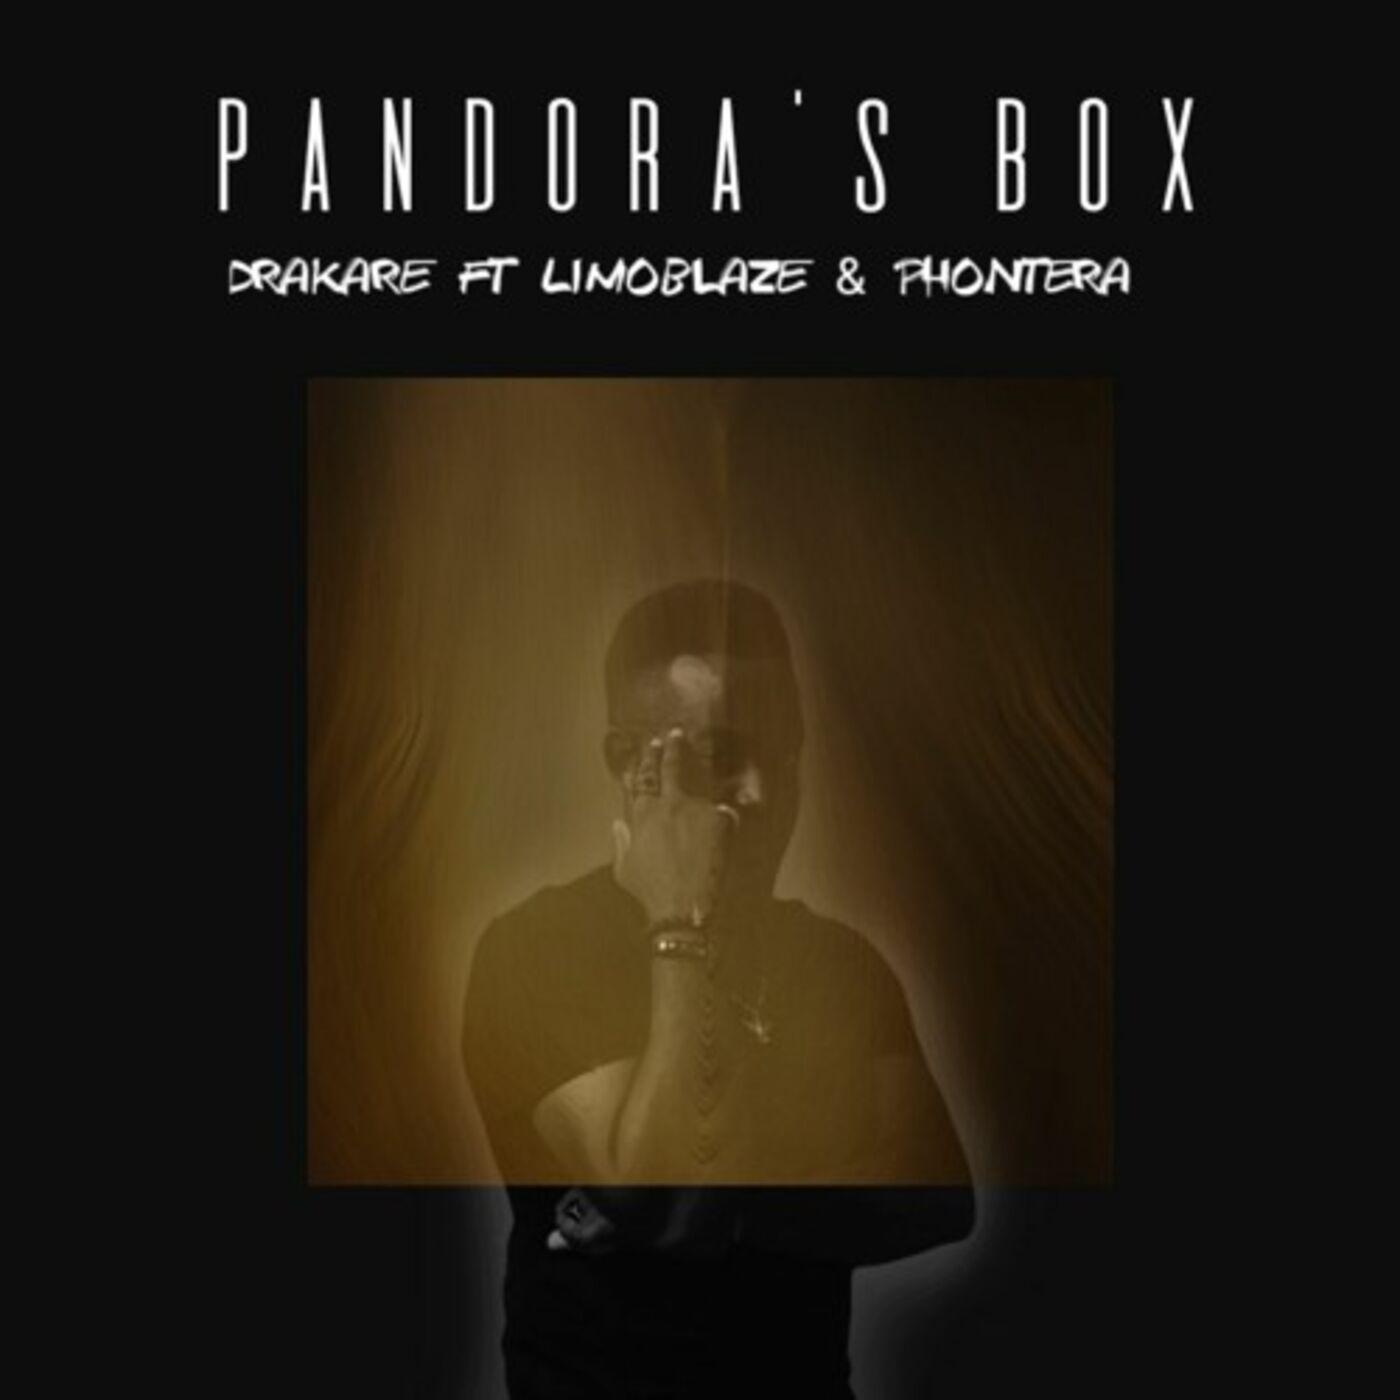 Pandora's Box - Drakare (ft). Limoblaze & Phontera